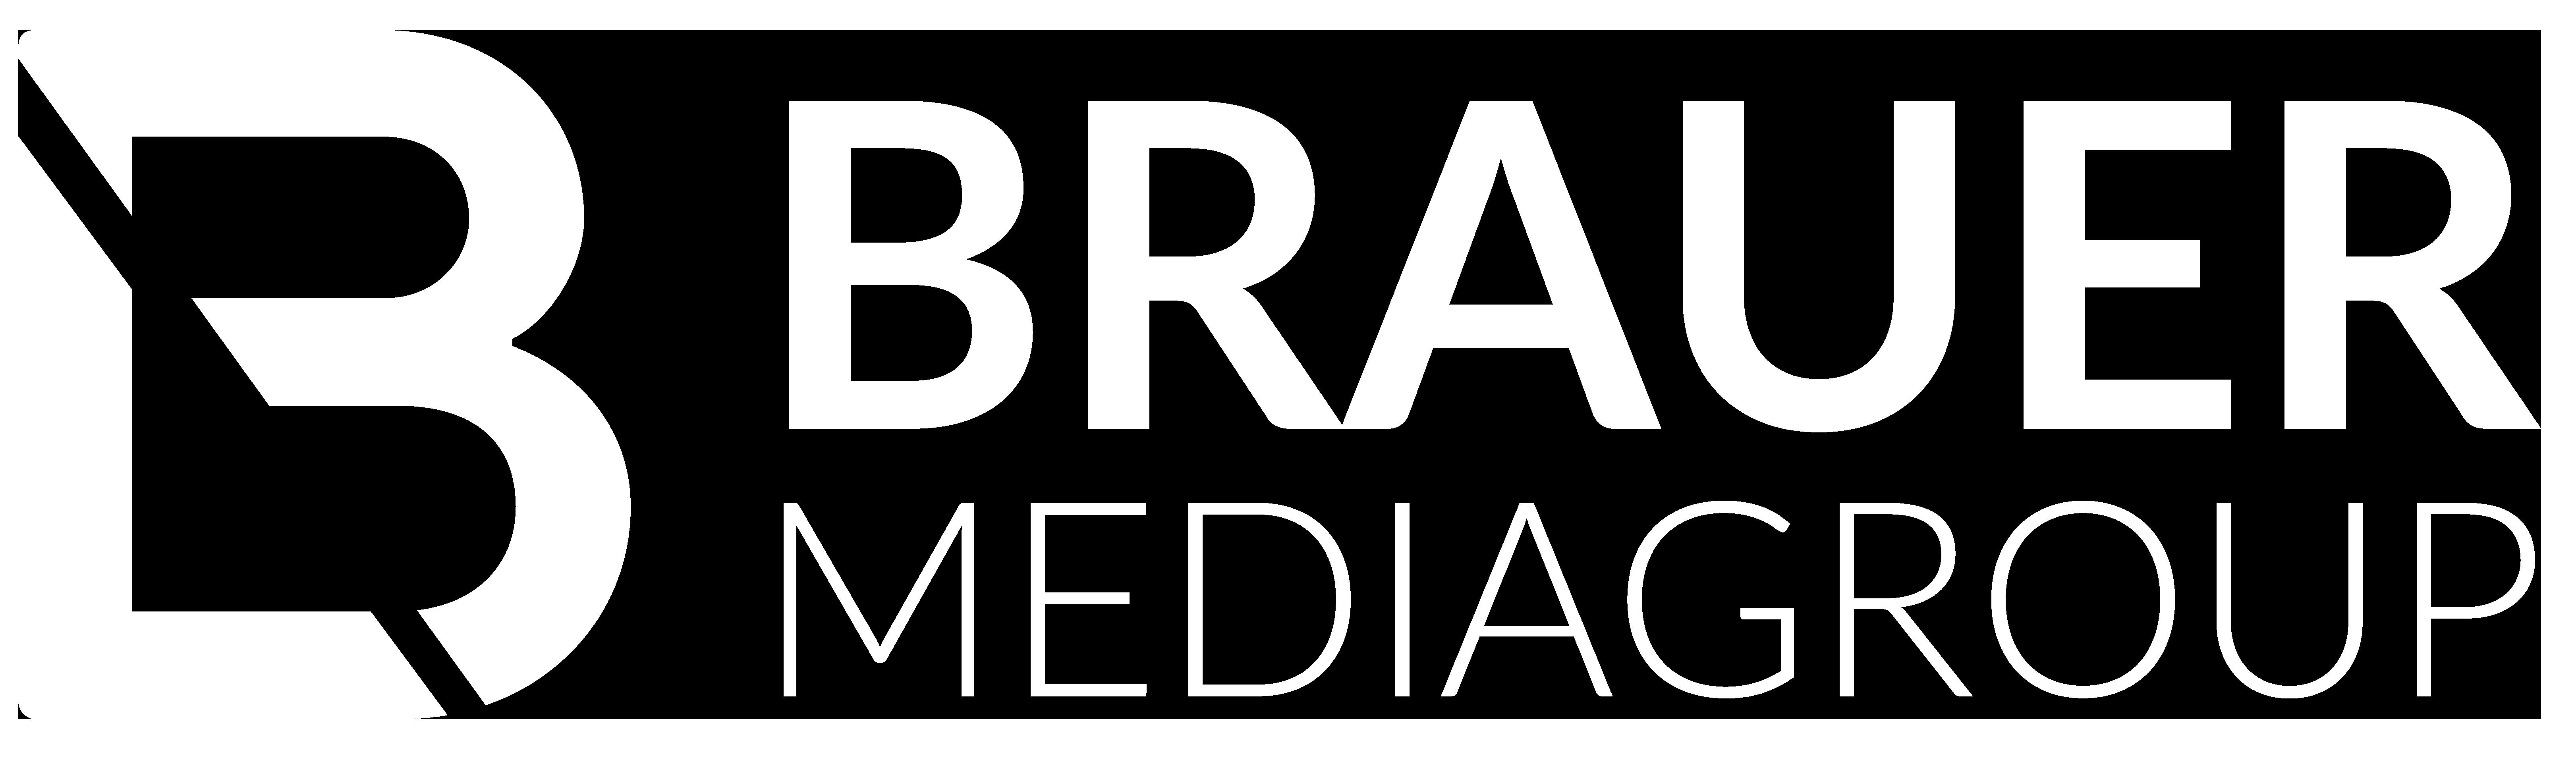 BRAUER Mediagroup